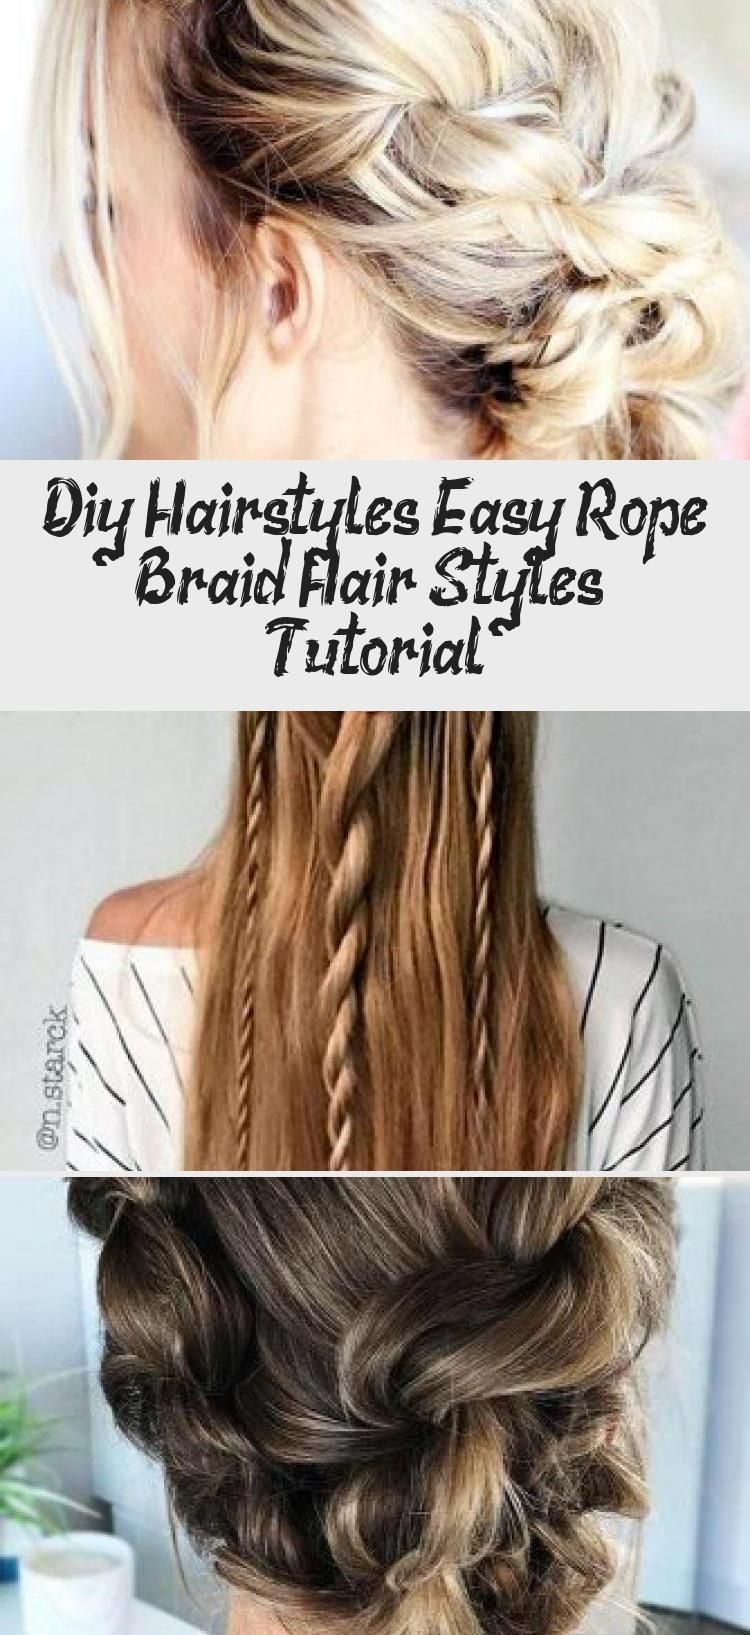 Victorianhairtutorial Hairtutorialquick Hairtutorialwithbangs Hairtutorialwaterfall Hairtut In 2020 Diy Hairstyles Easy Rope Braided Hairstyle Hair Tutorial Quick